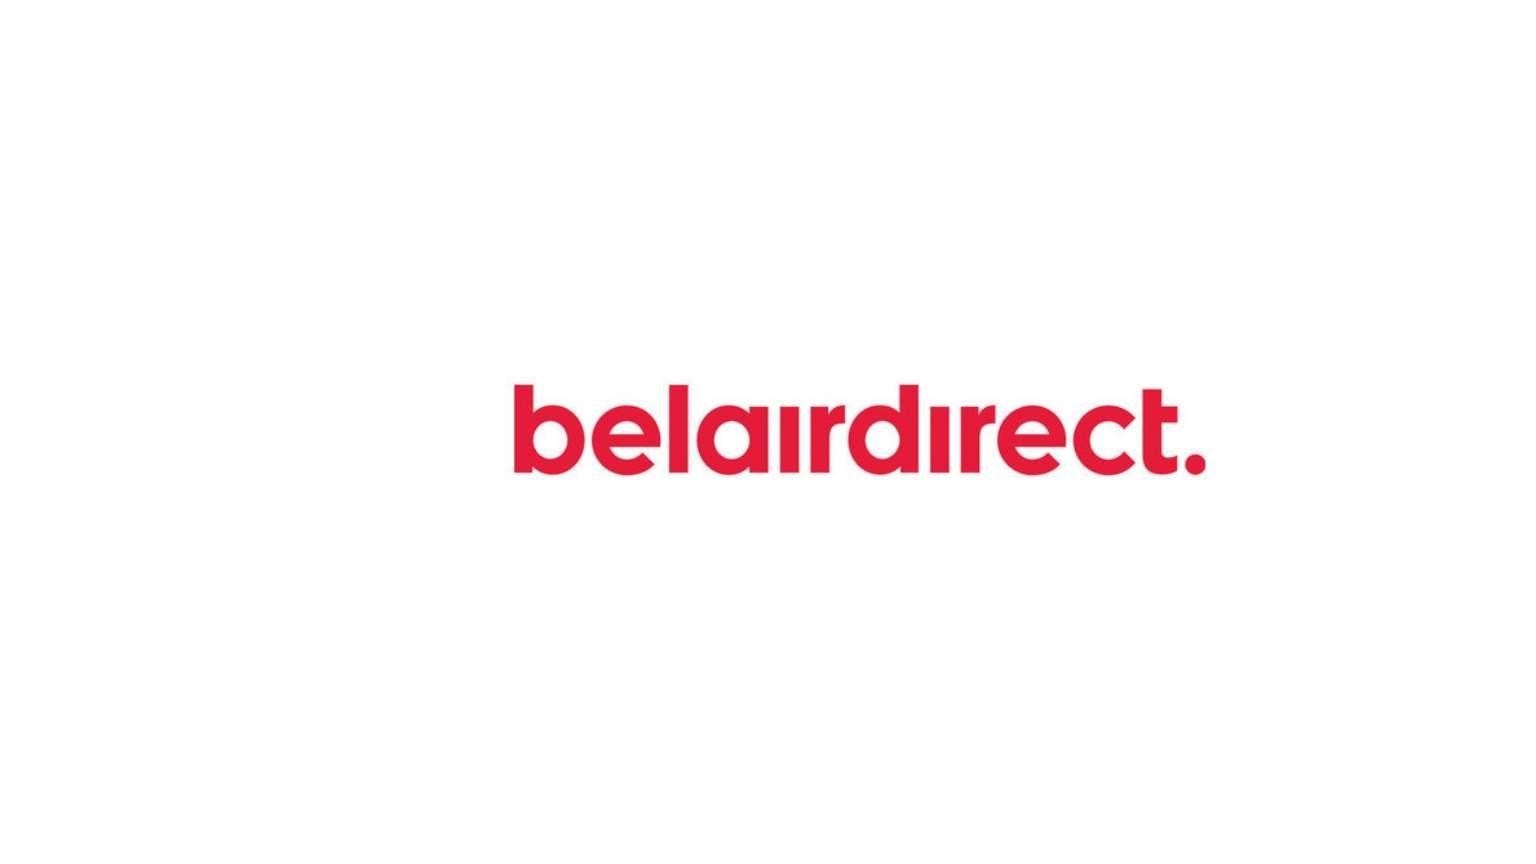 belairdirect logo